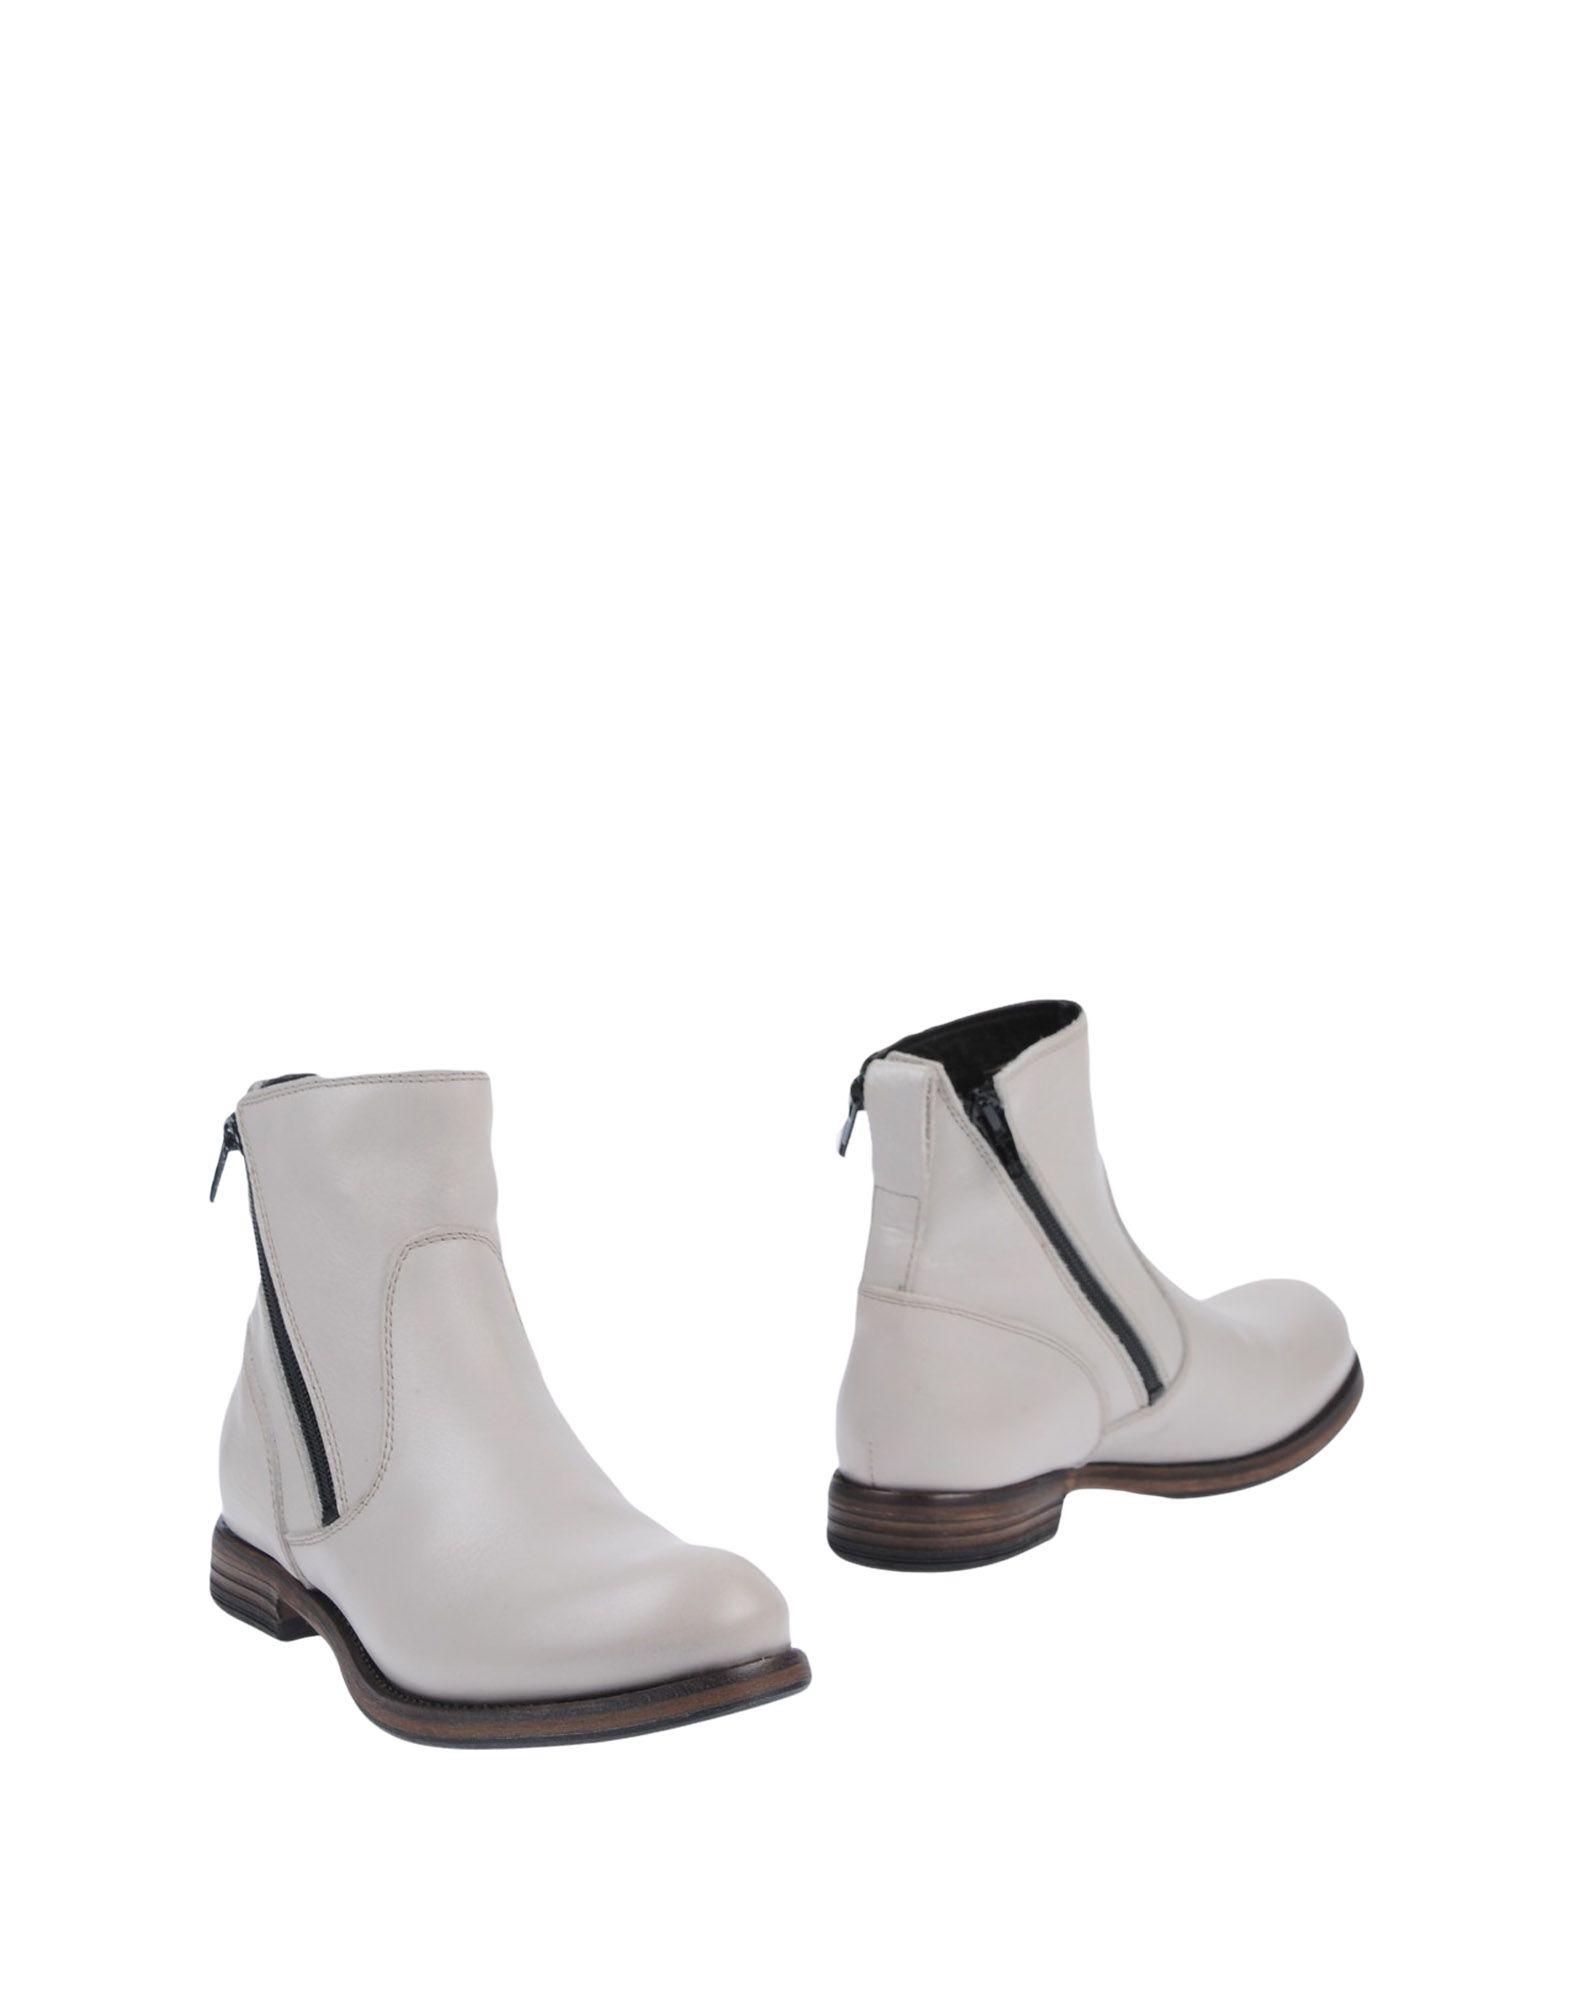 Bottine Moma Femme - Bottines Moma Gris Chaussures femme pas cher homme et femme